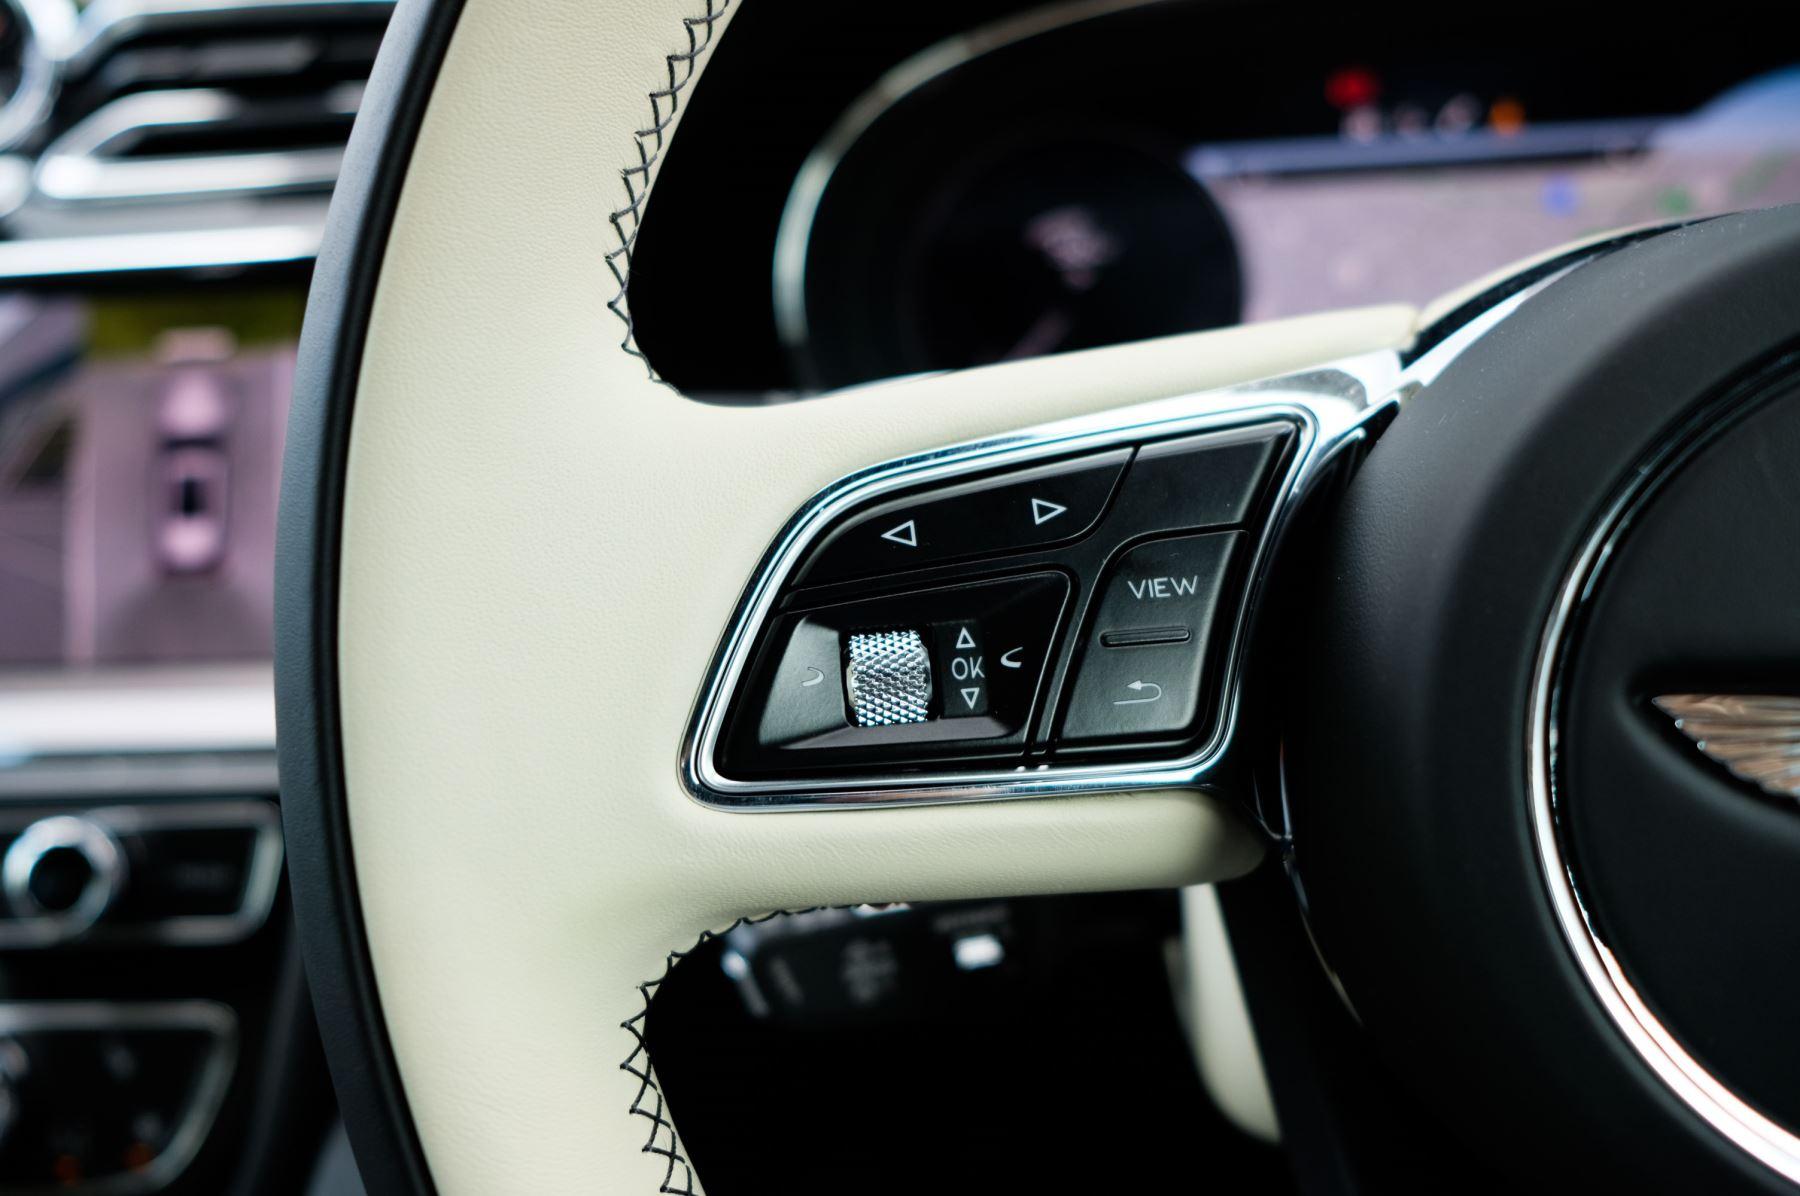 Bentley Bentayga 4.0 V8 - Mulliner Driving Specification for Black Specification image 24